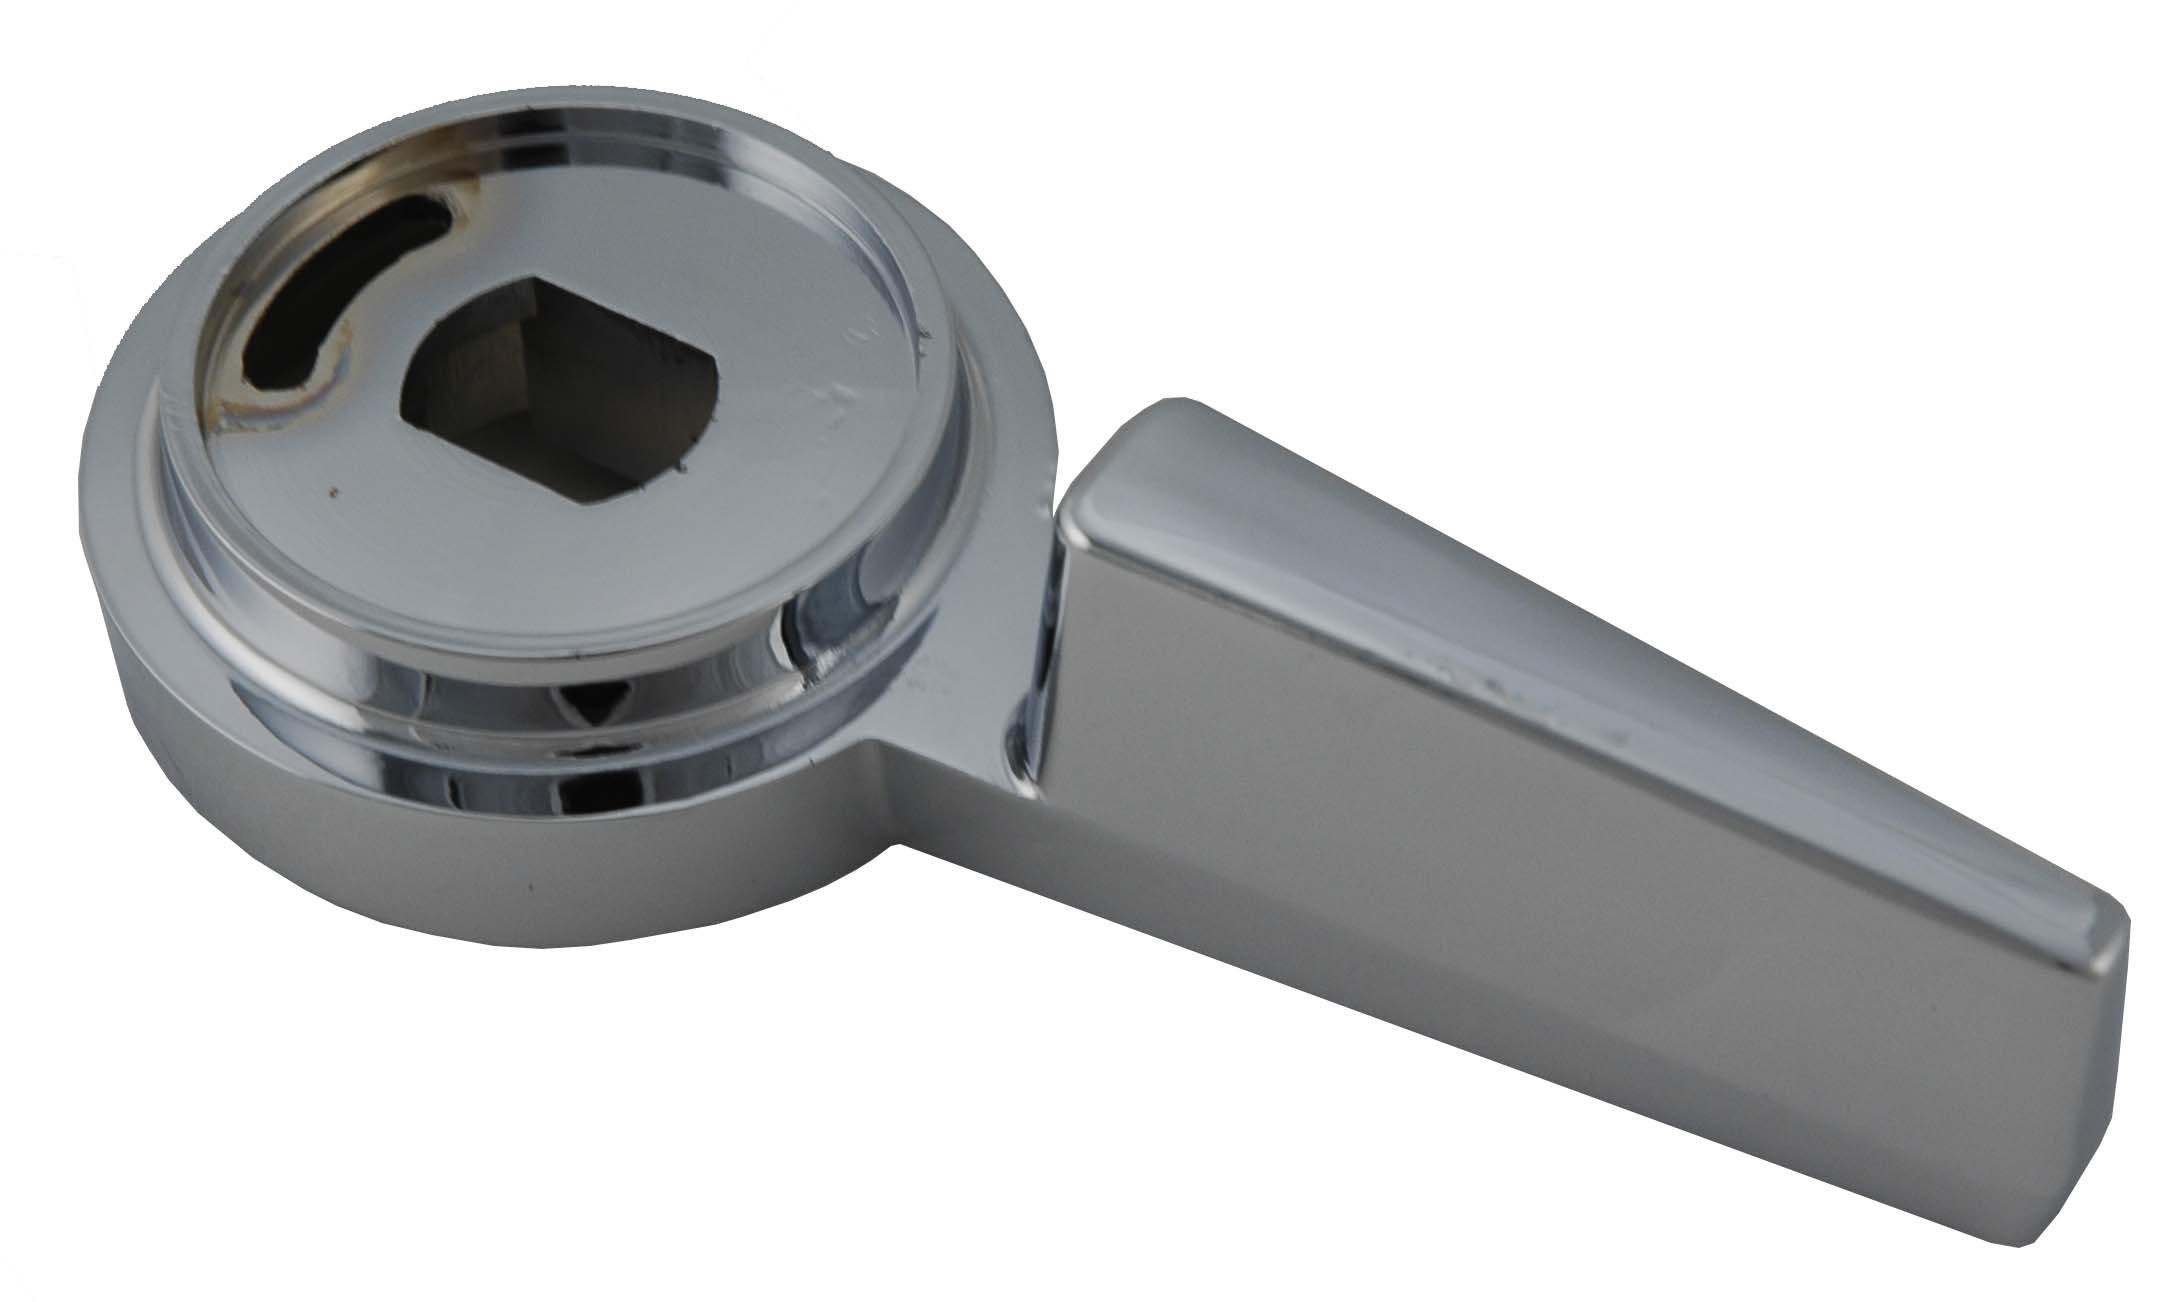 Generic Mixet MRH-MET Shower Temperature & Volume Control Metal Handles, Chrome Finish - By Plumb USA 34453 & 34461